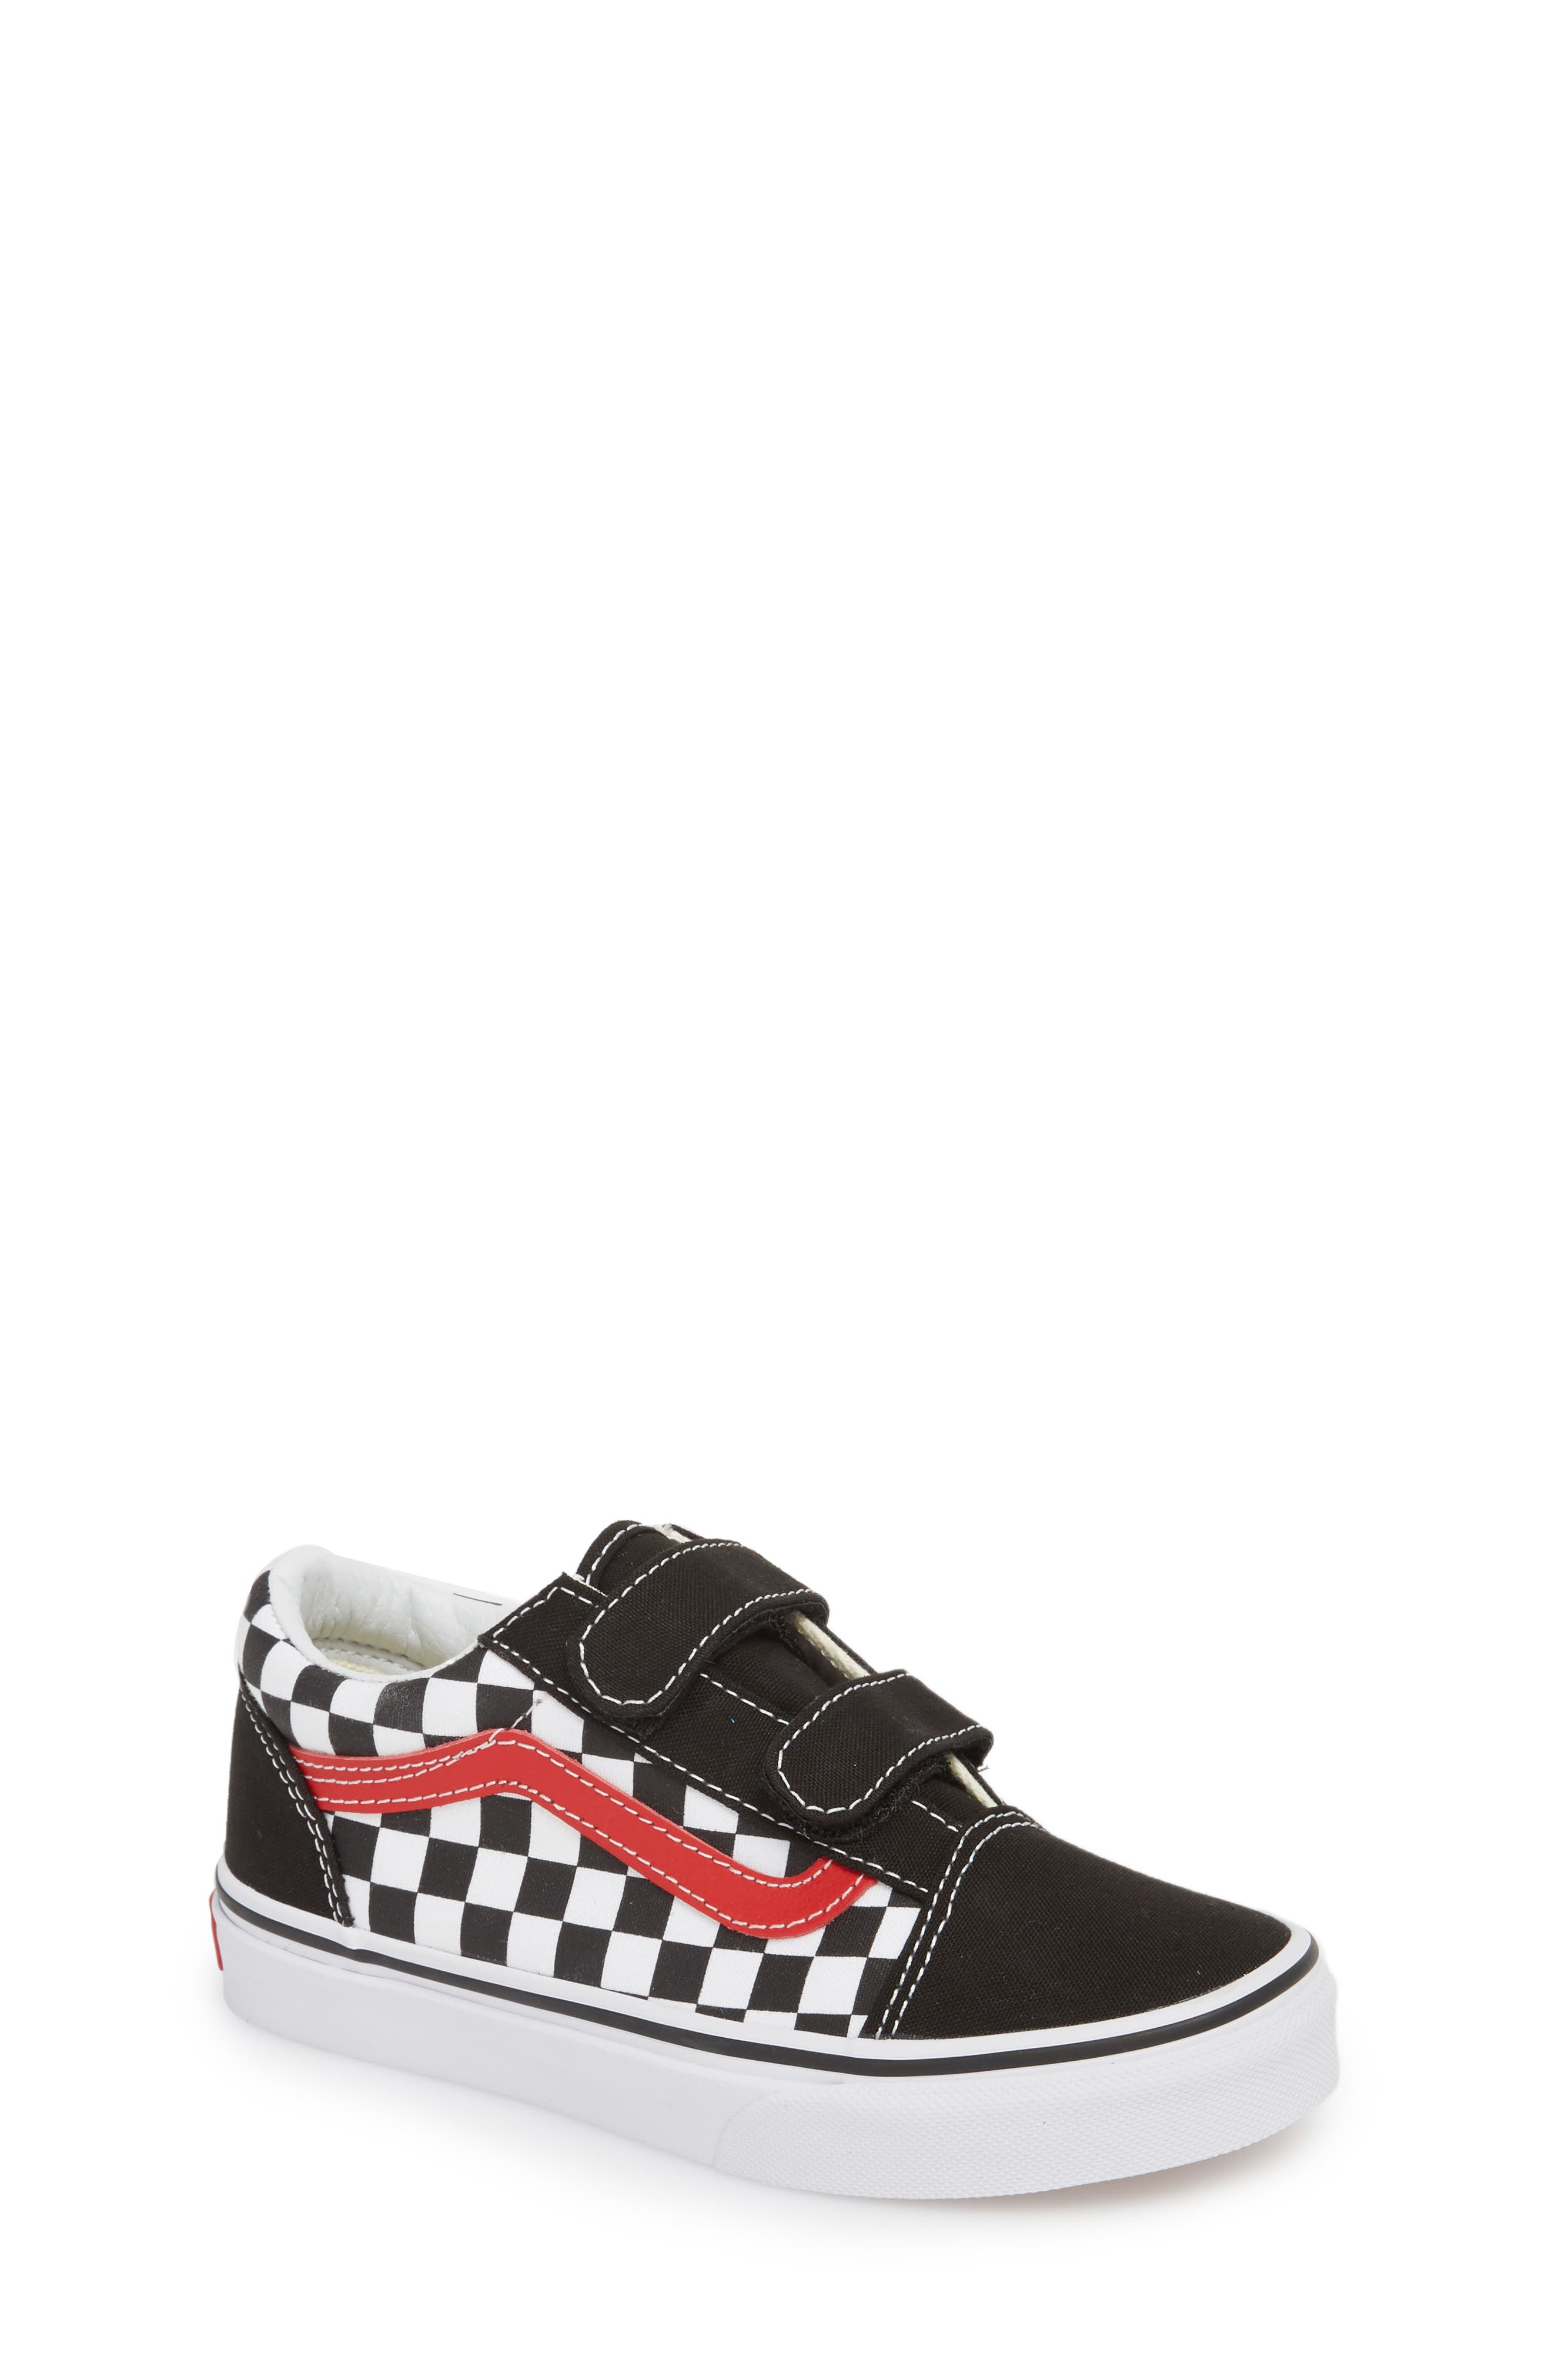 Old Skool V Sneaker,                             Main thumbnail 1, color,                             Checkerboard Black/ Red/ White